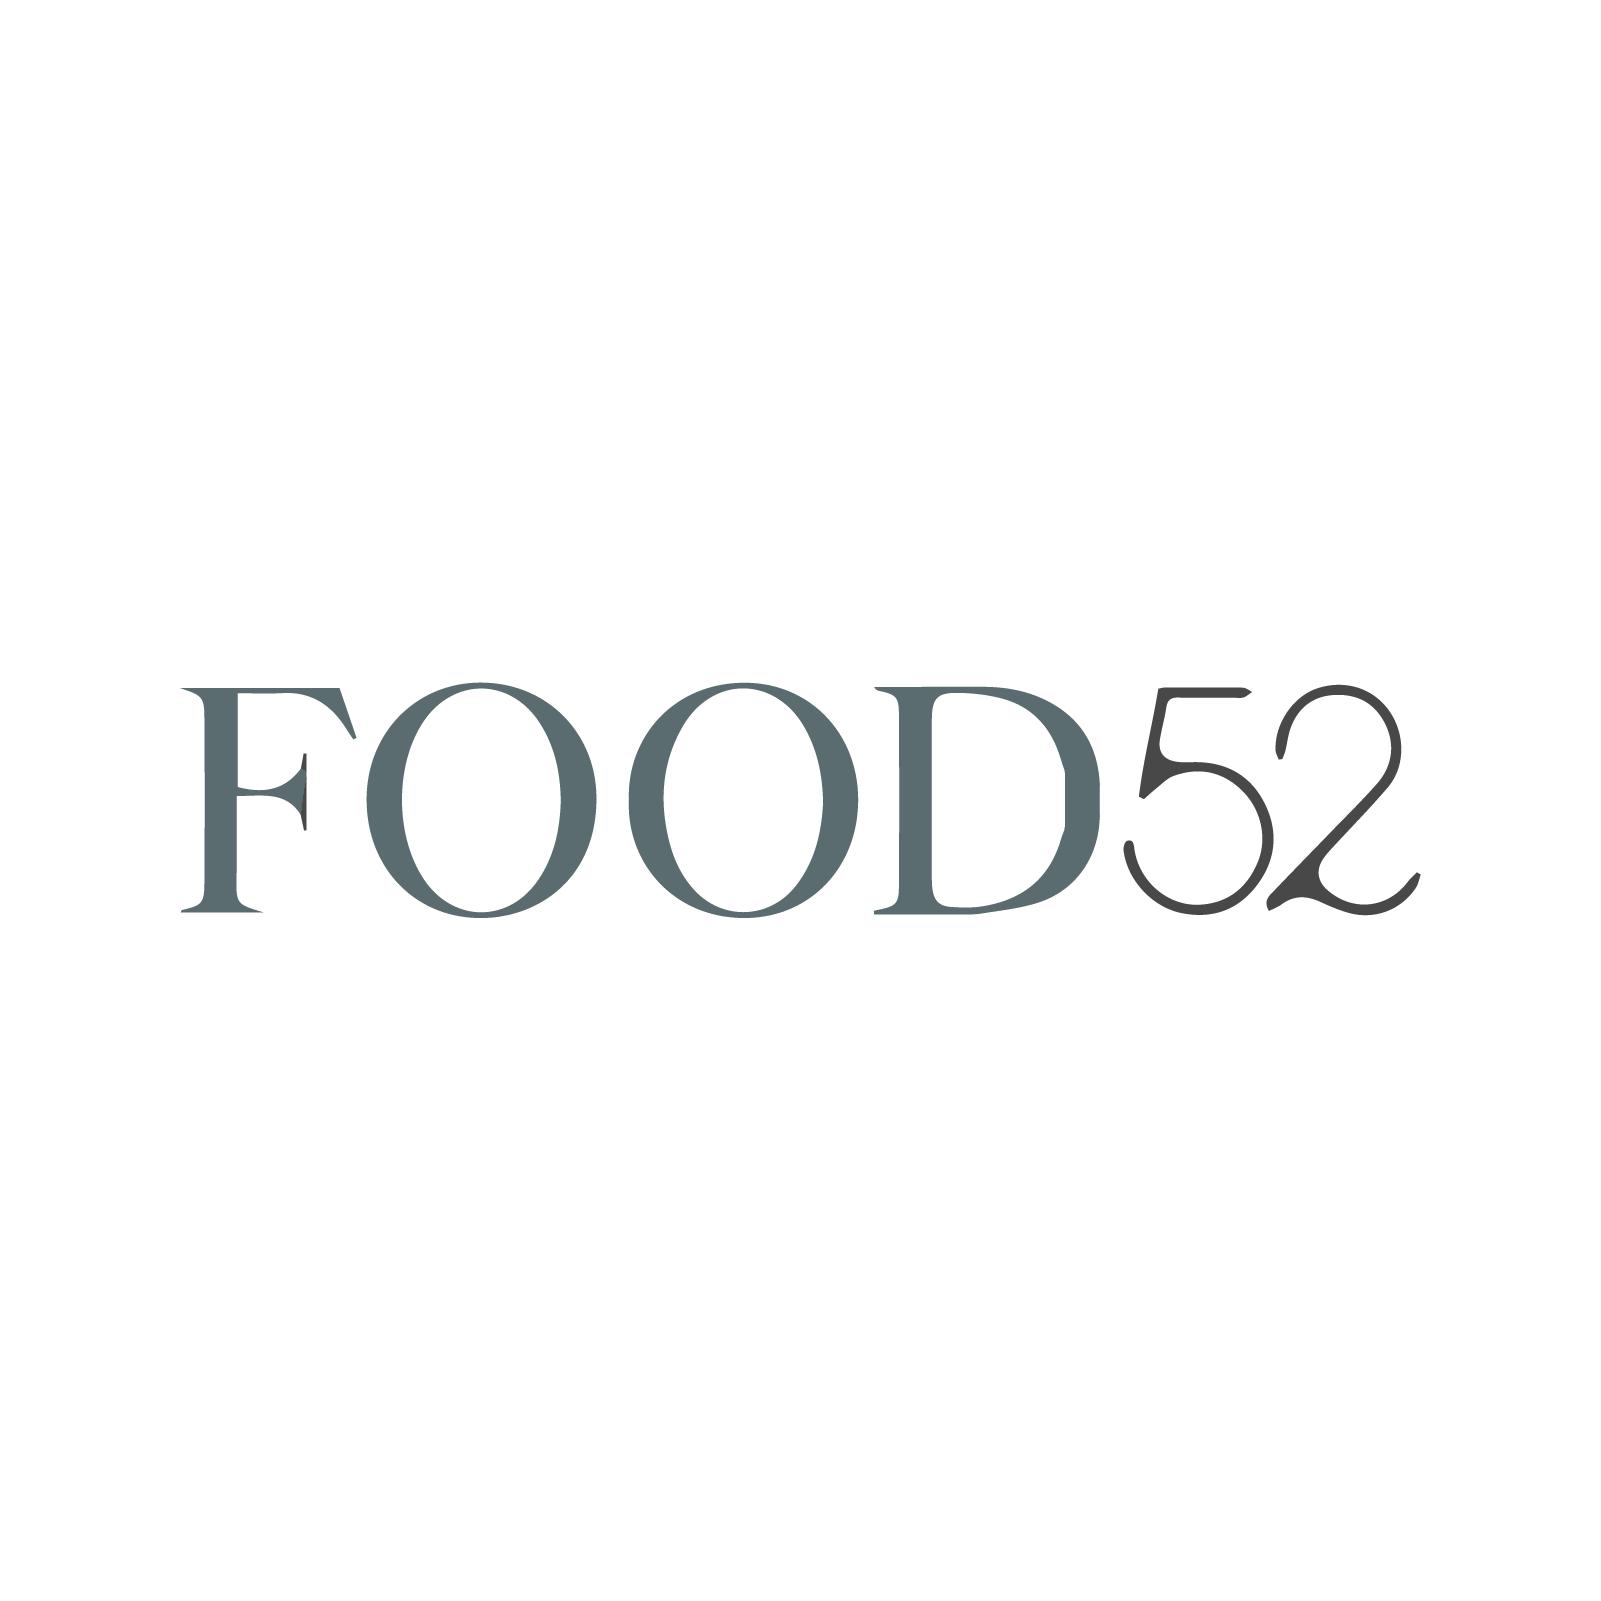 Press Logos_Food 52.png